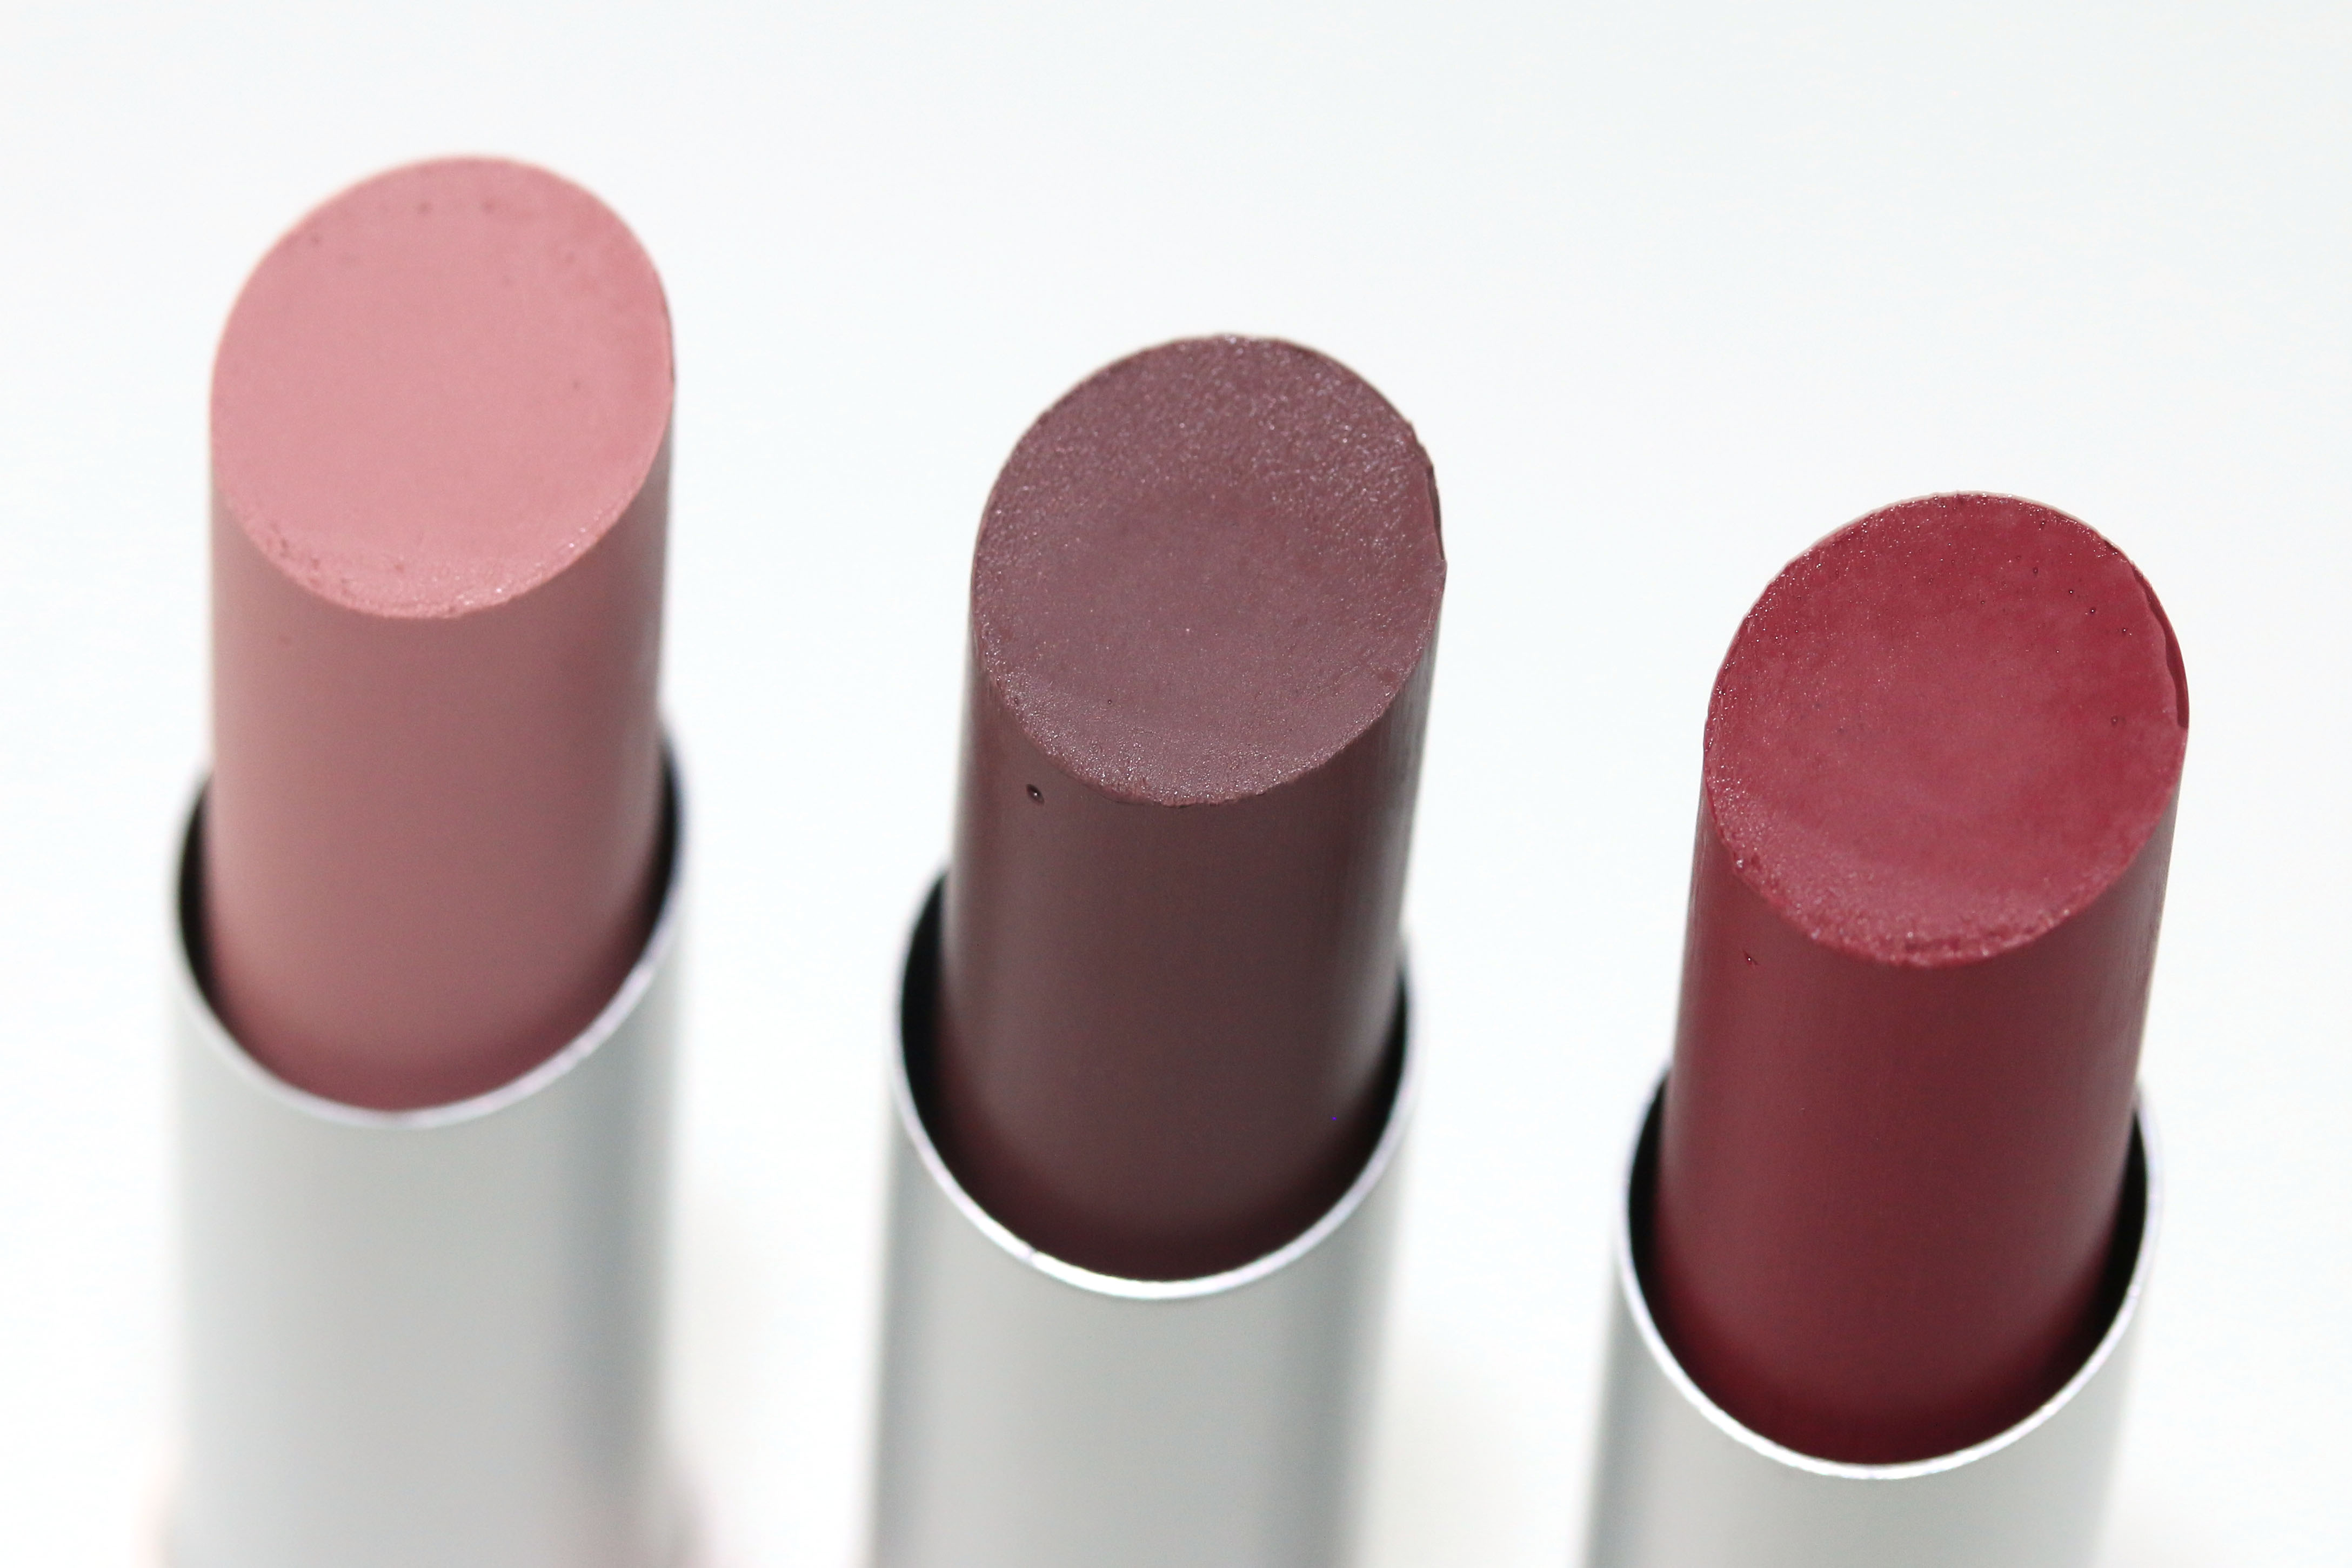 Alverde Natural Brightness Lippenstifte